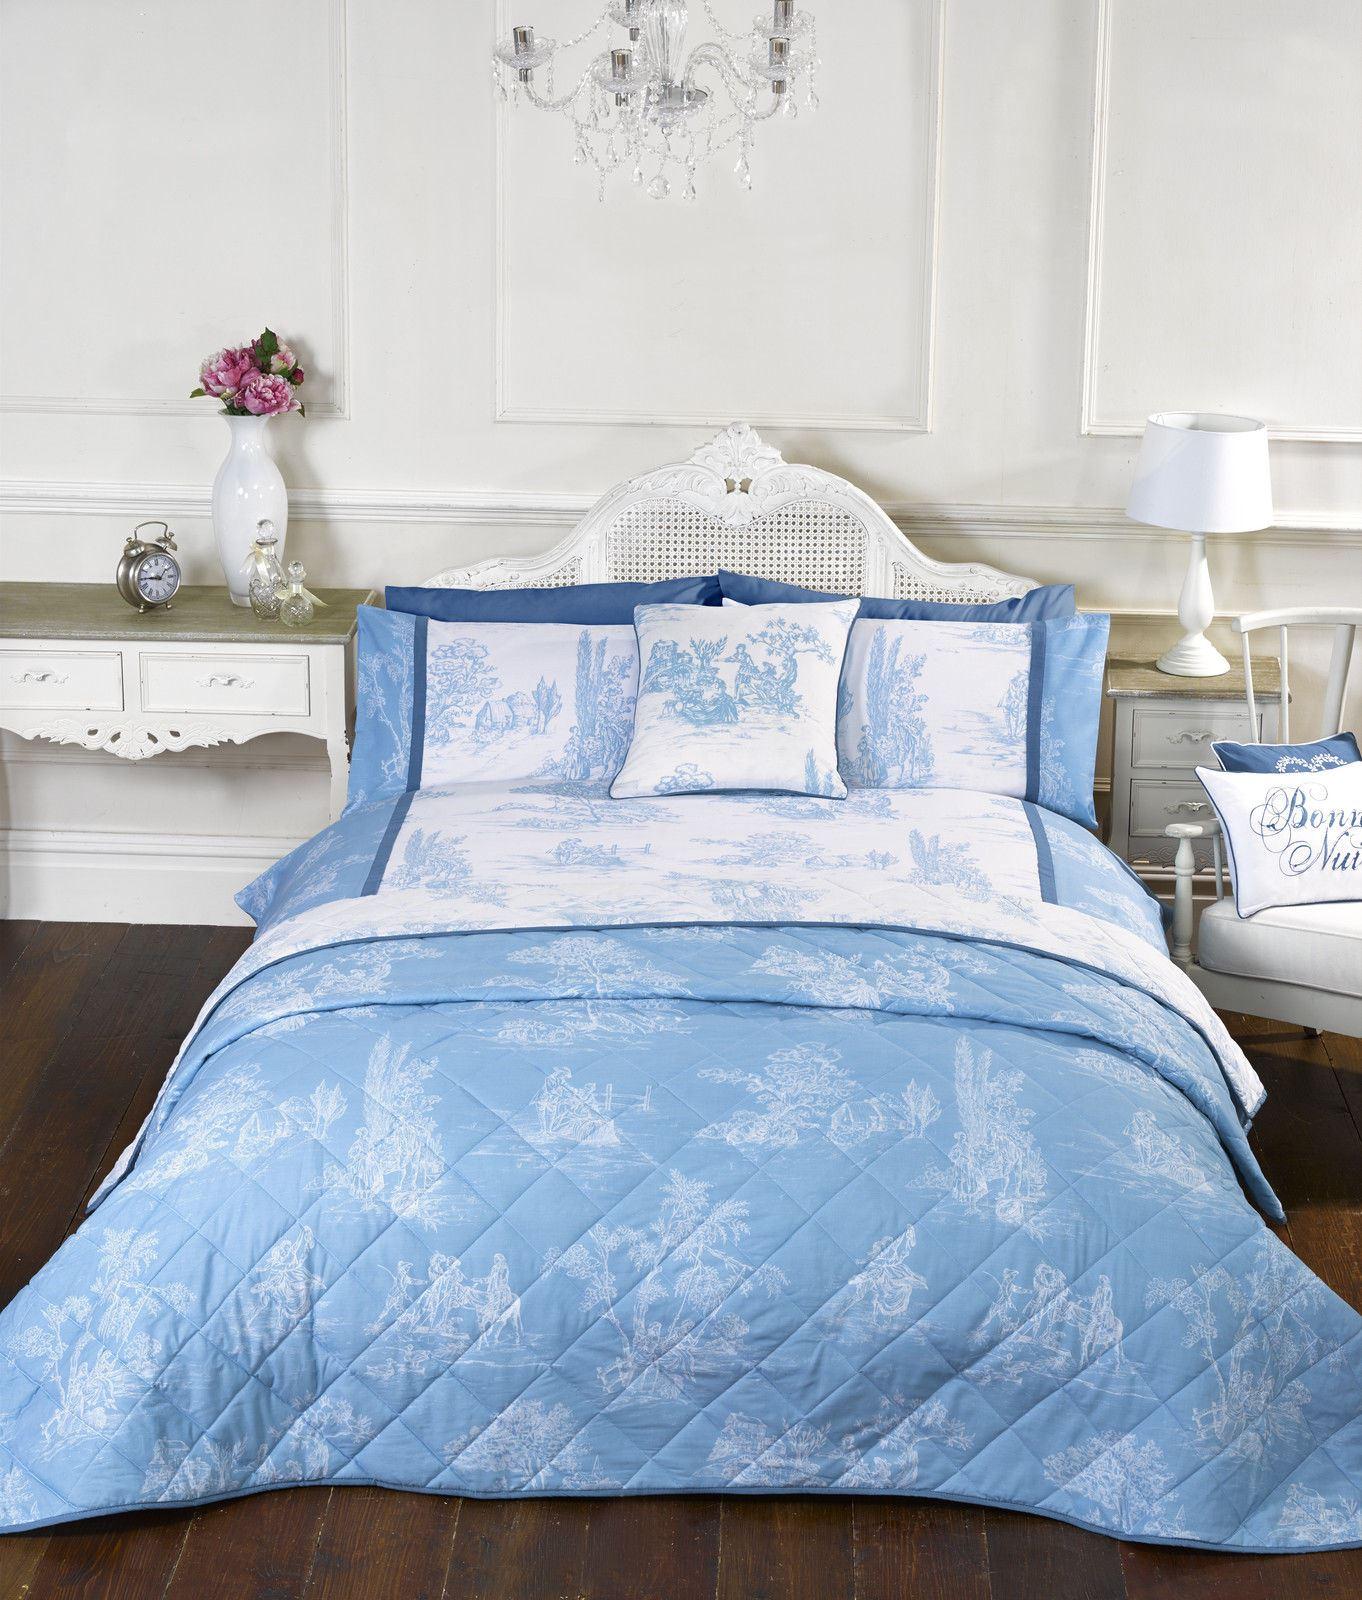 French country toile camargue duvet cover bedding range - Fundas nordicas vintage ...